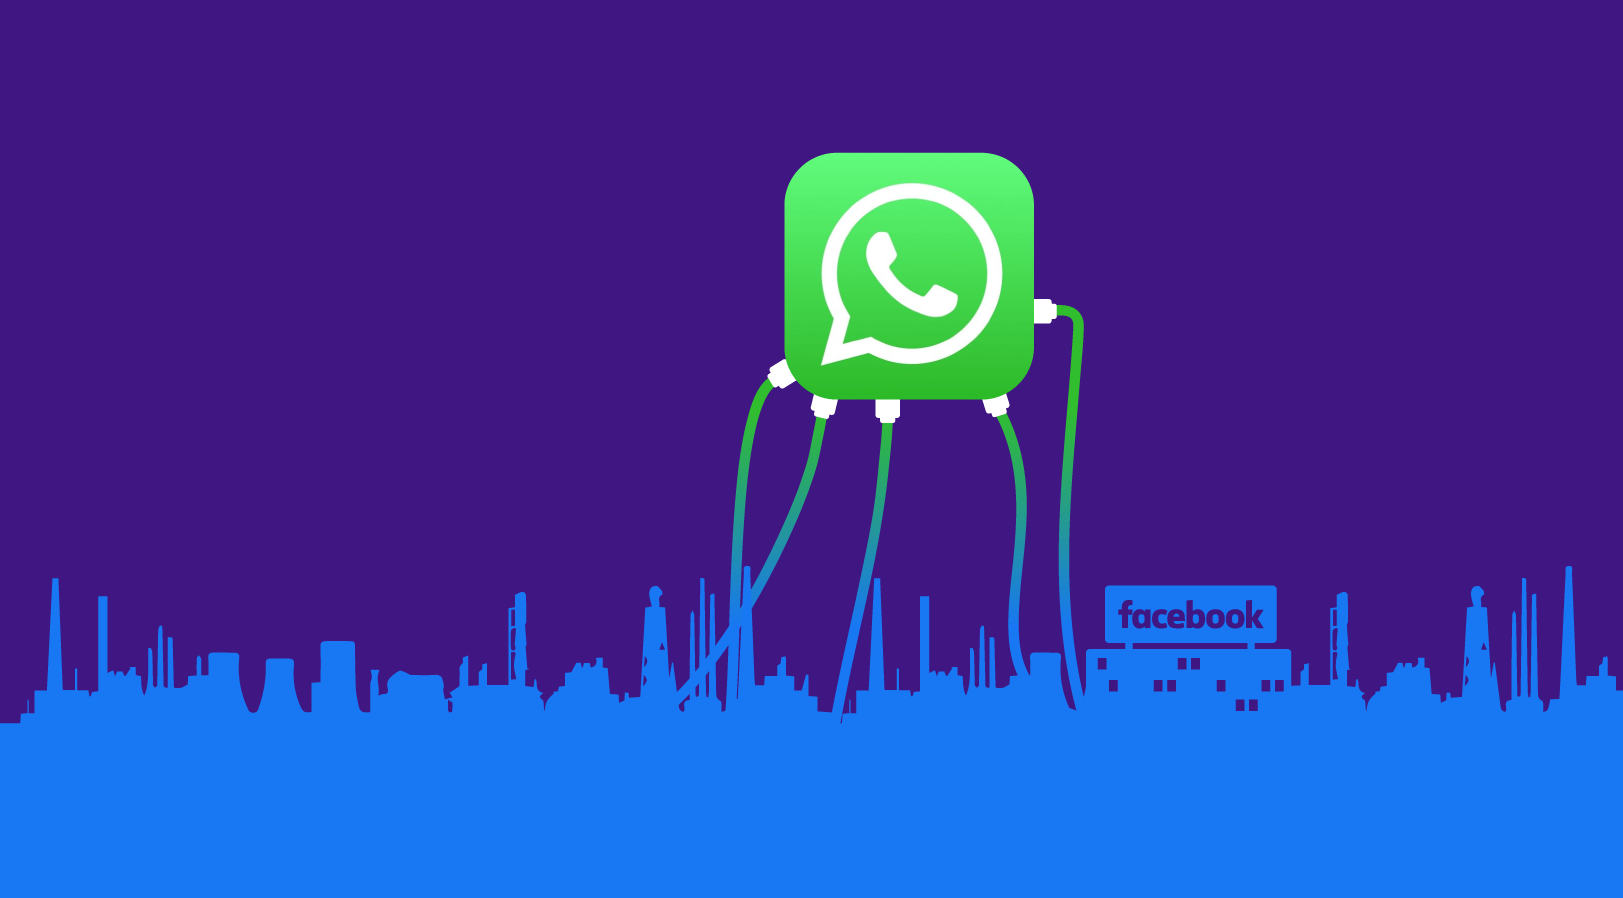 whatsapp-health-alternatives-blog